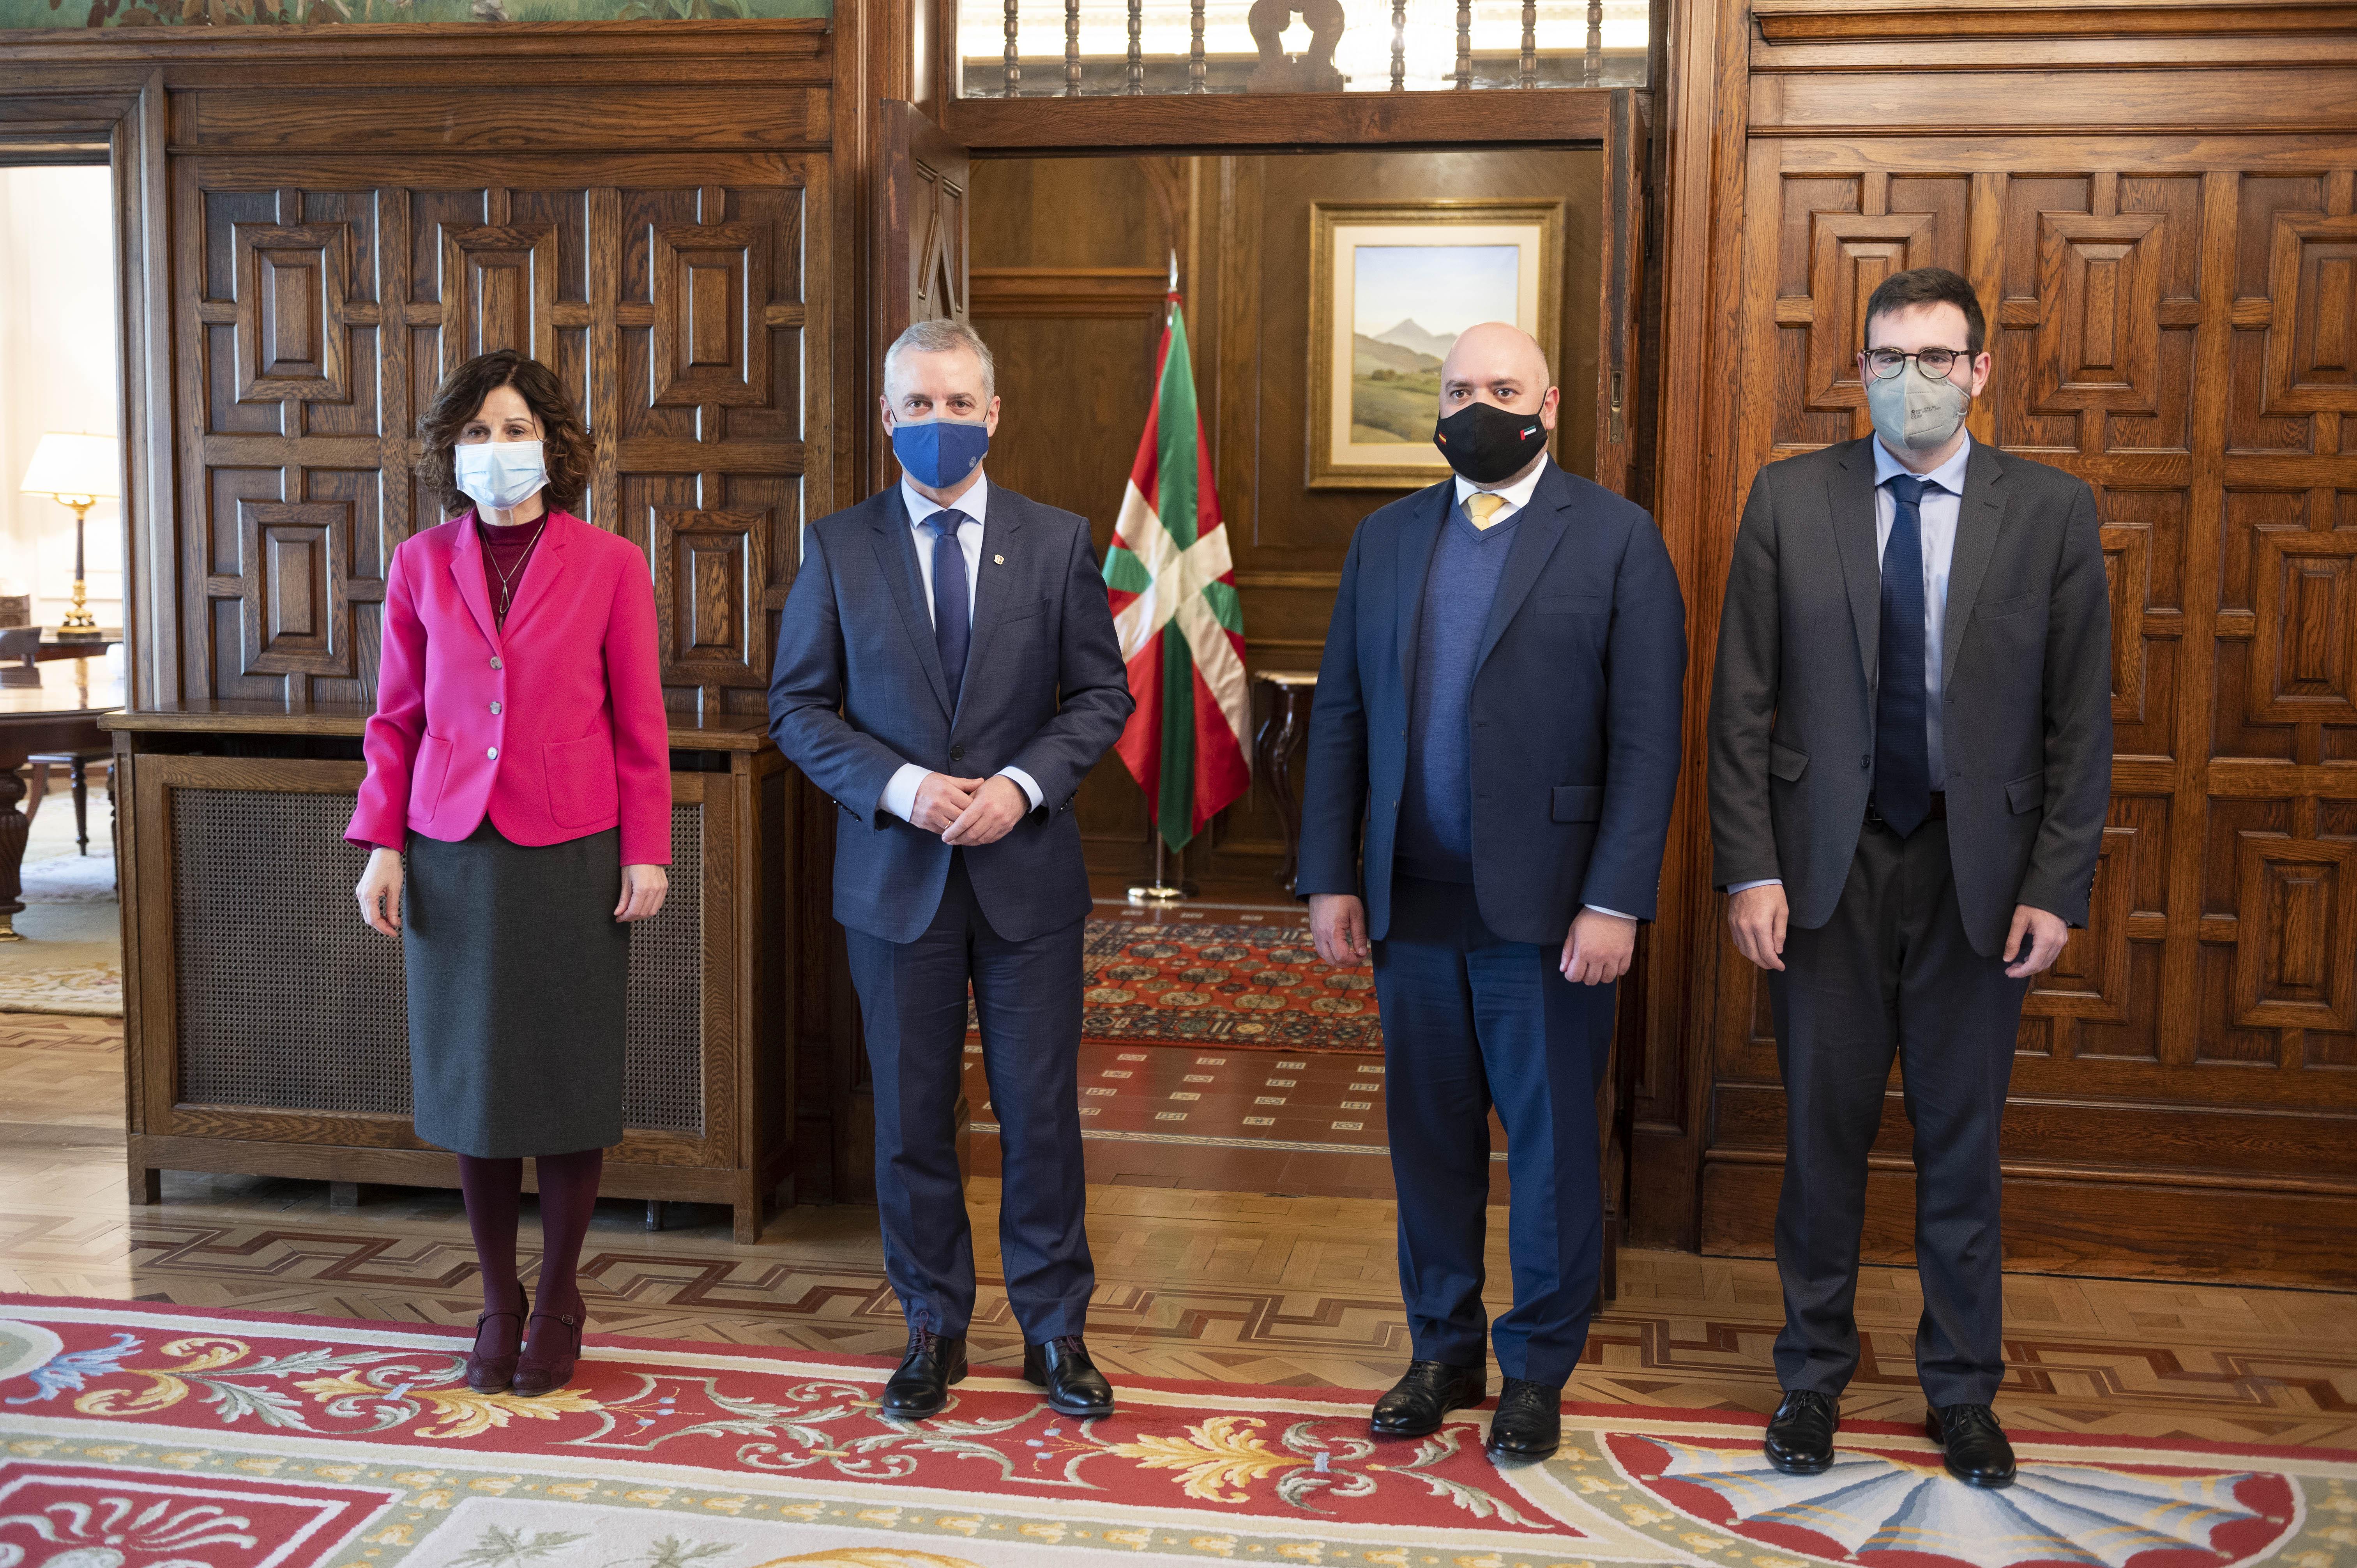 El Lehendakari recibe al Embajador de Emiratos Árabes [1:24]